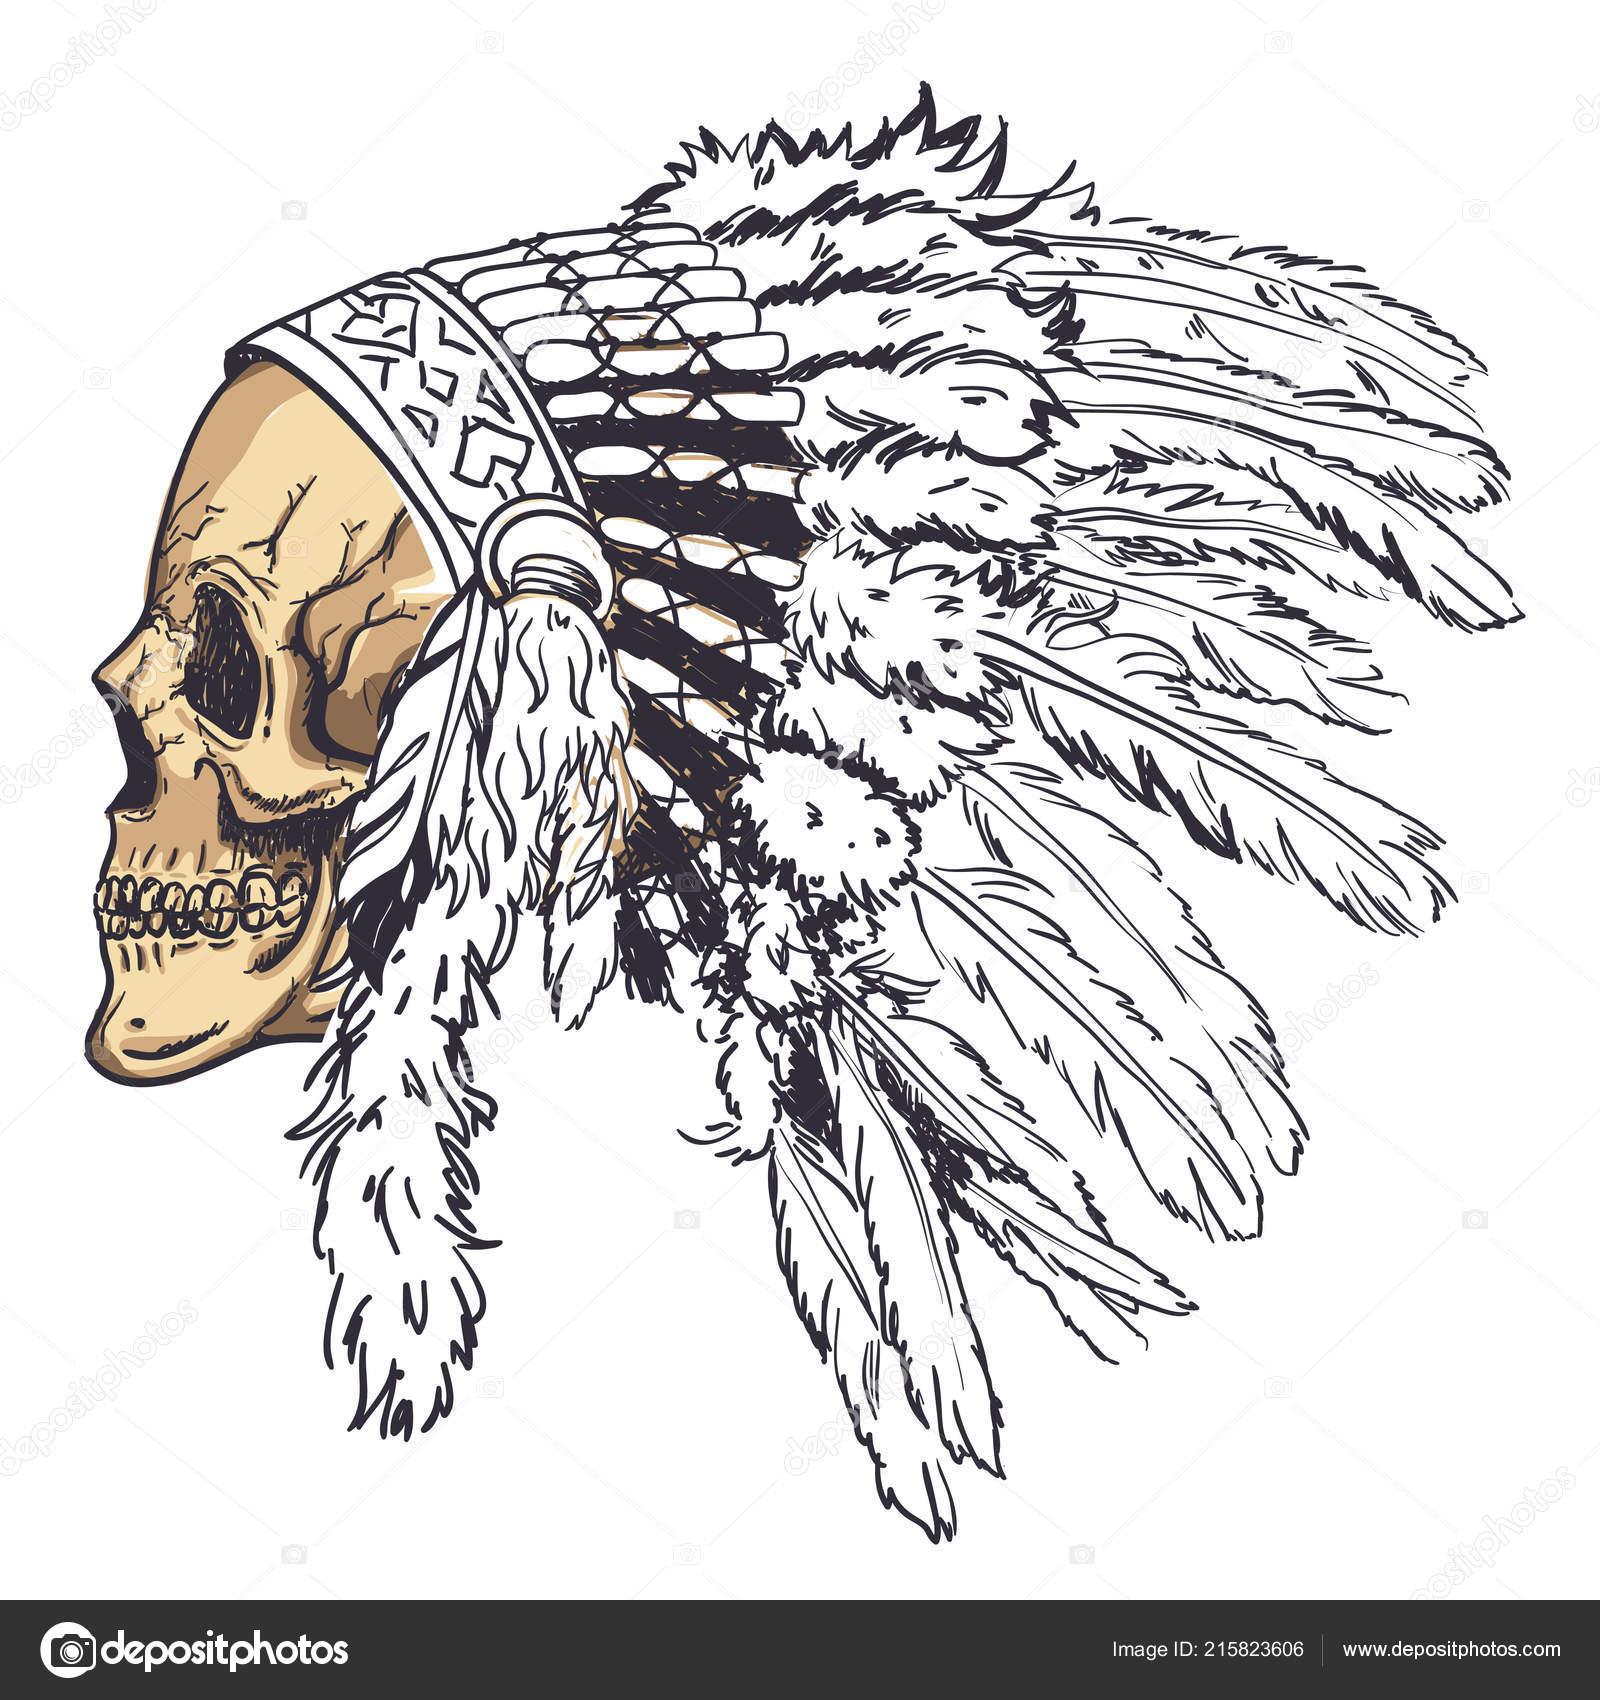 Calavera con sombrero de plumas indias en Dotwork estilo. Arte de vectores  Grunge– Ilustración de Stock 9dada9820bb